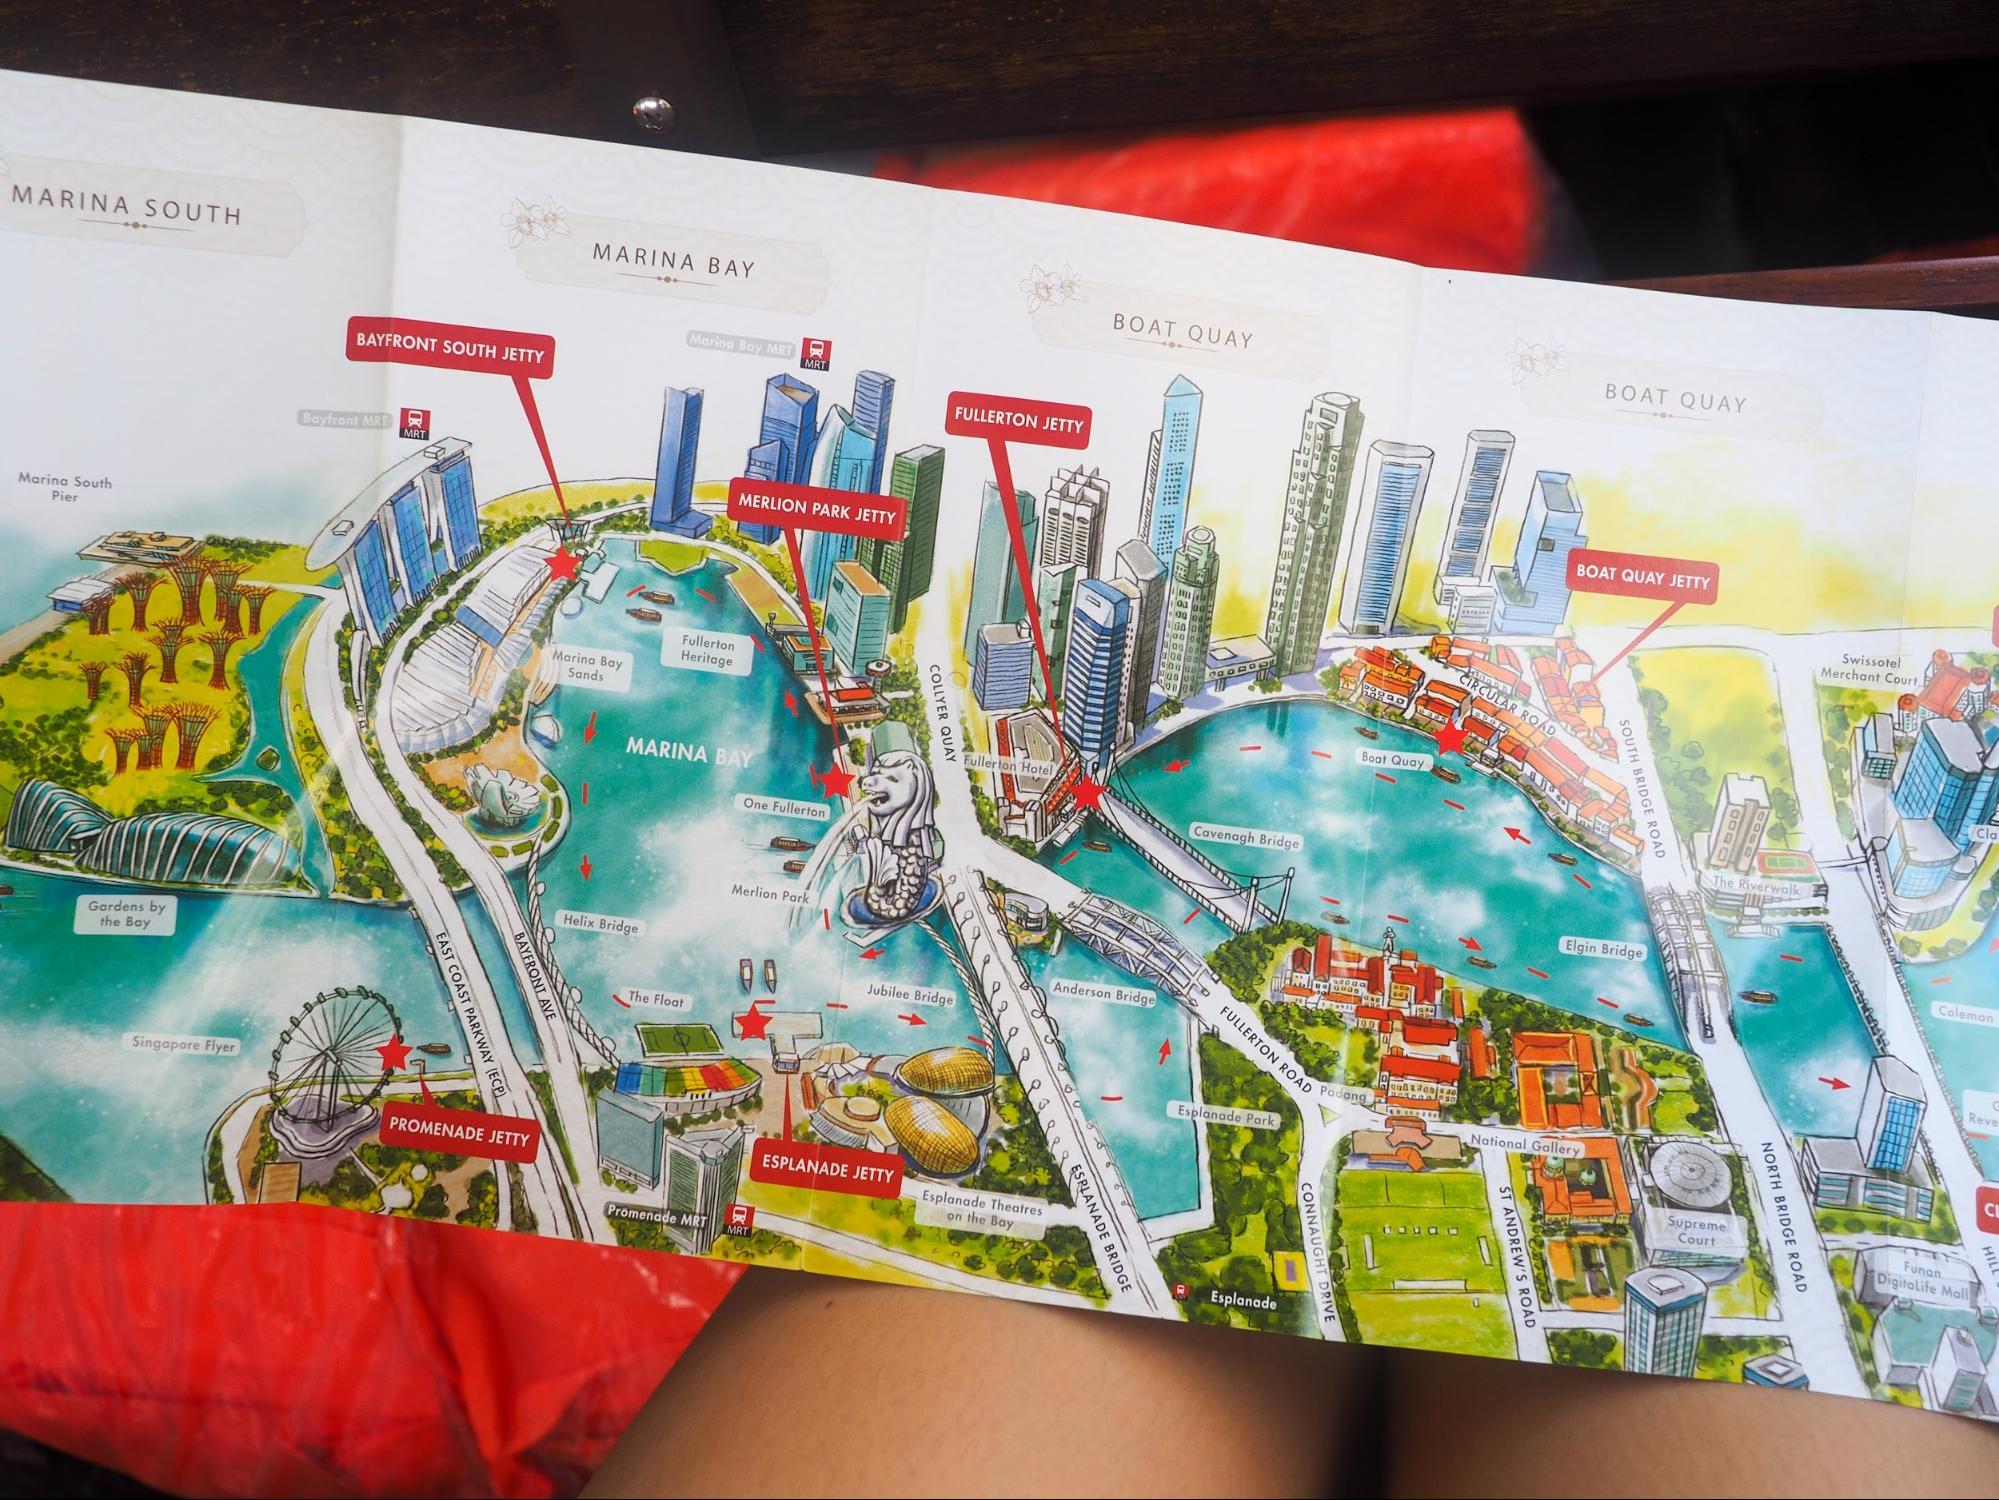 marina bay sands singapore 11 noi nhat dinh phai den4